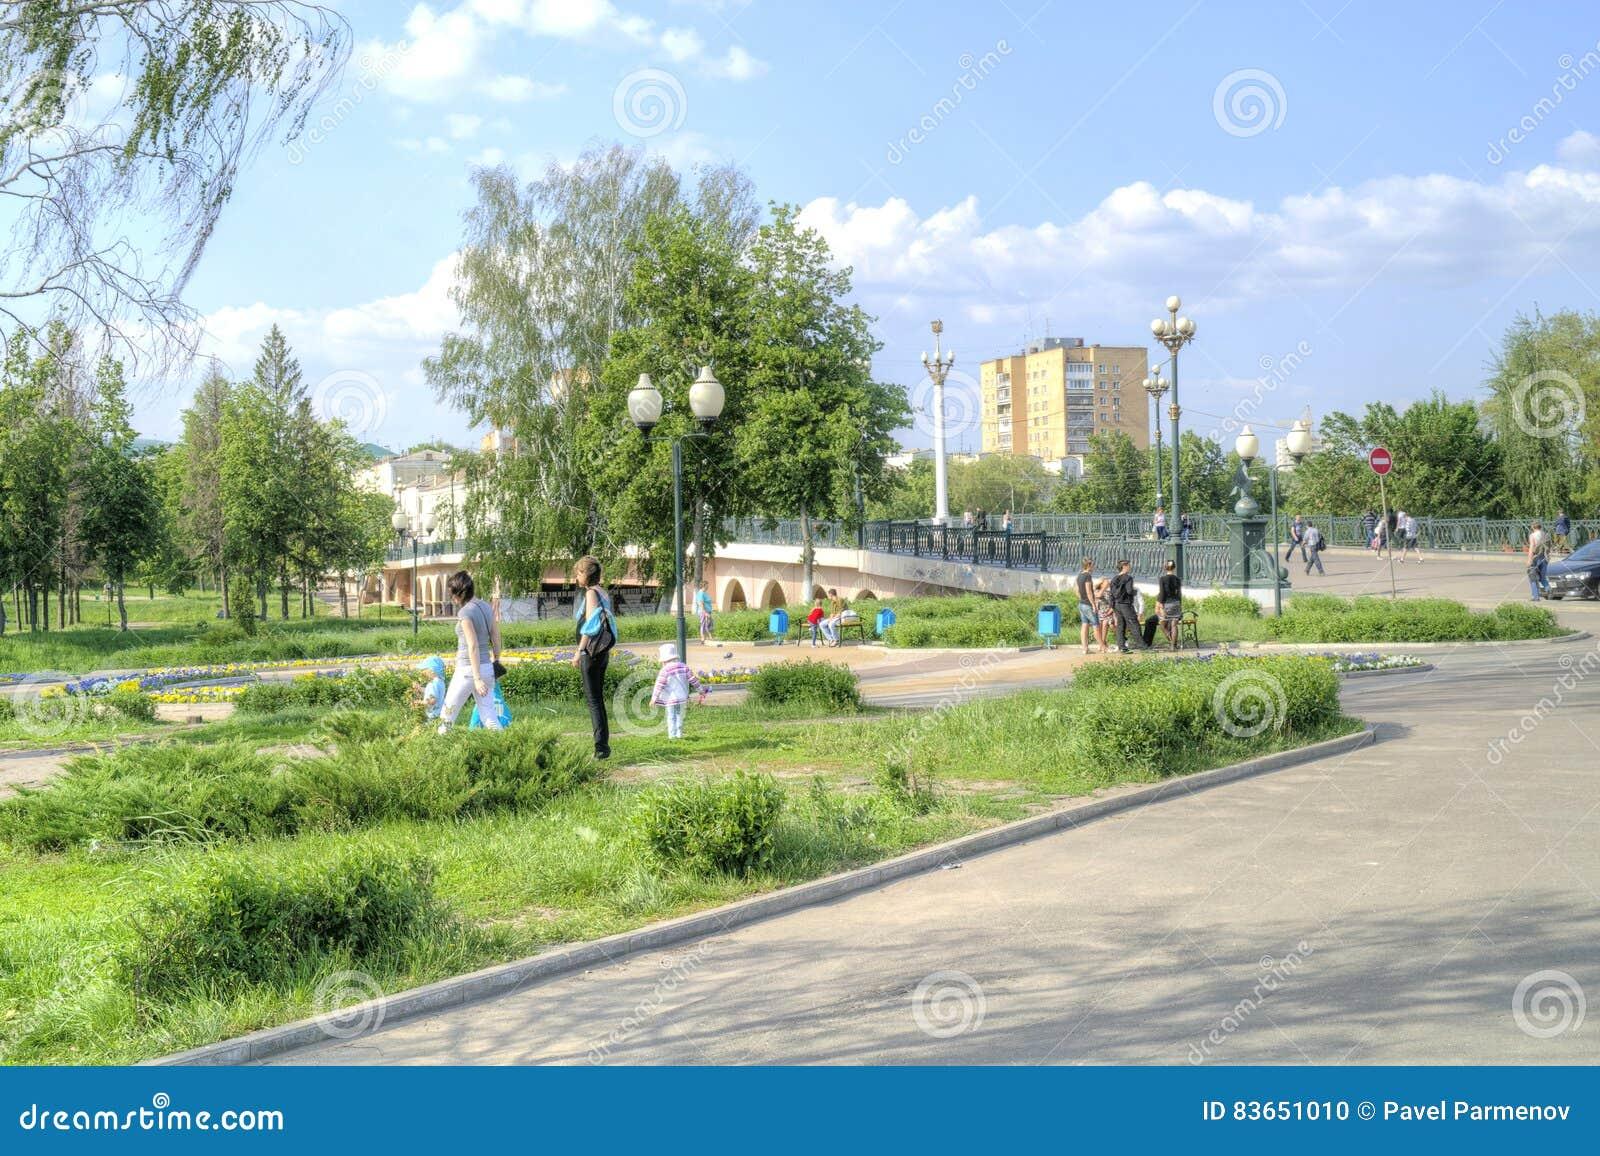 City Oryol. Square writer Nikolai Leskov